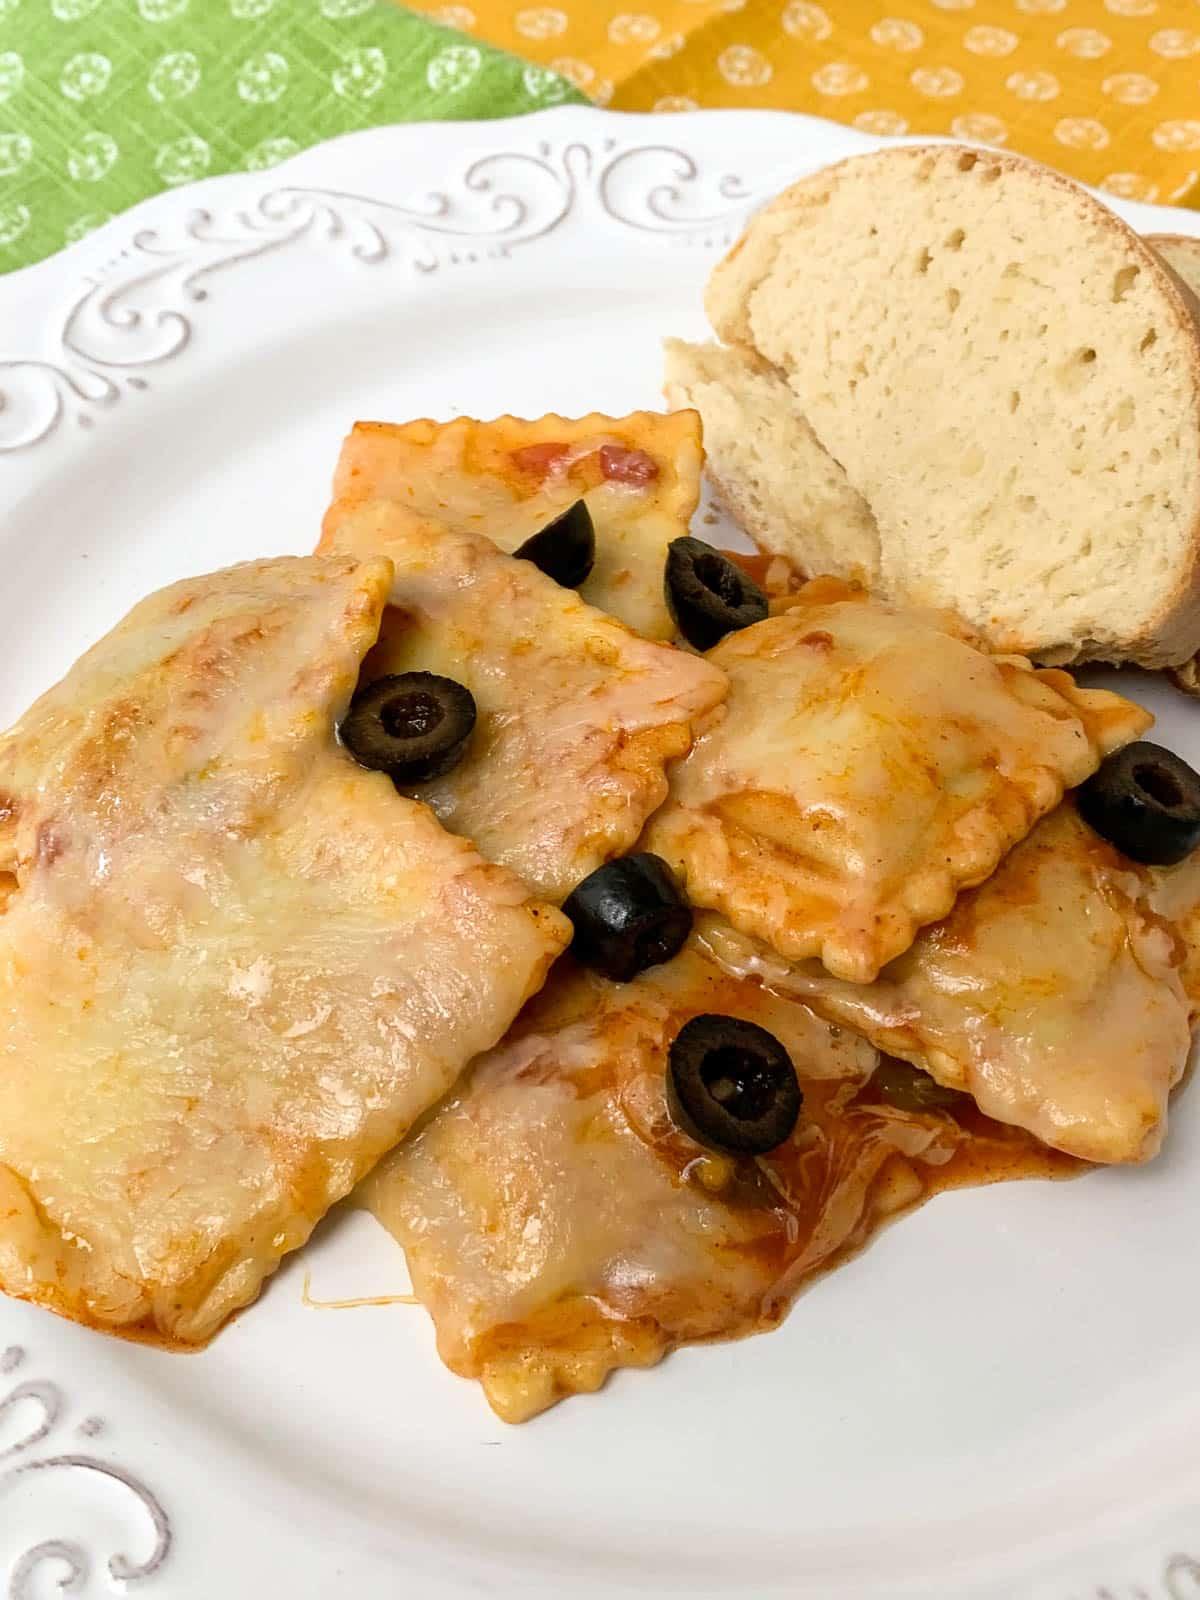 ravioli with black olives